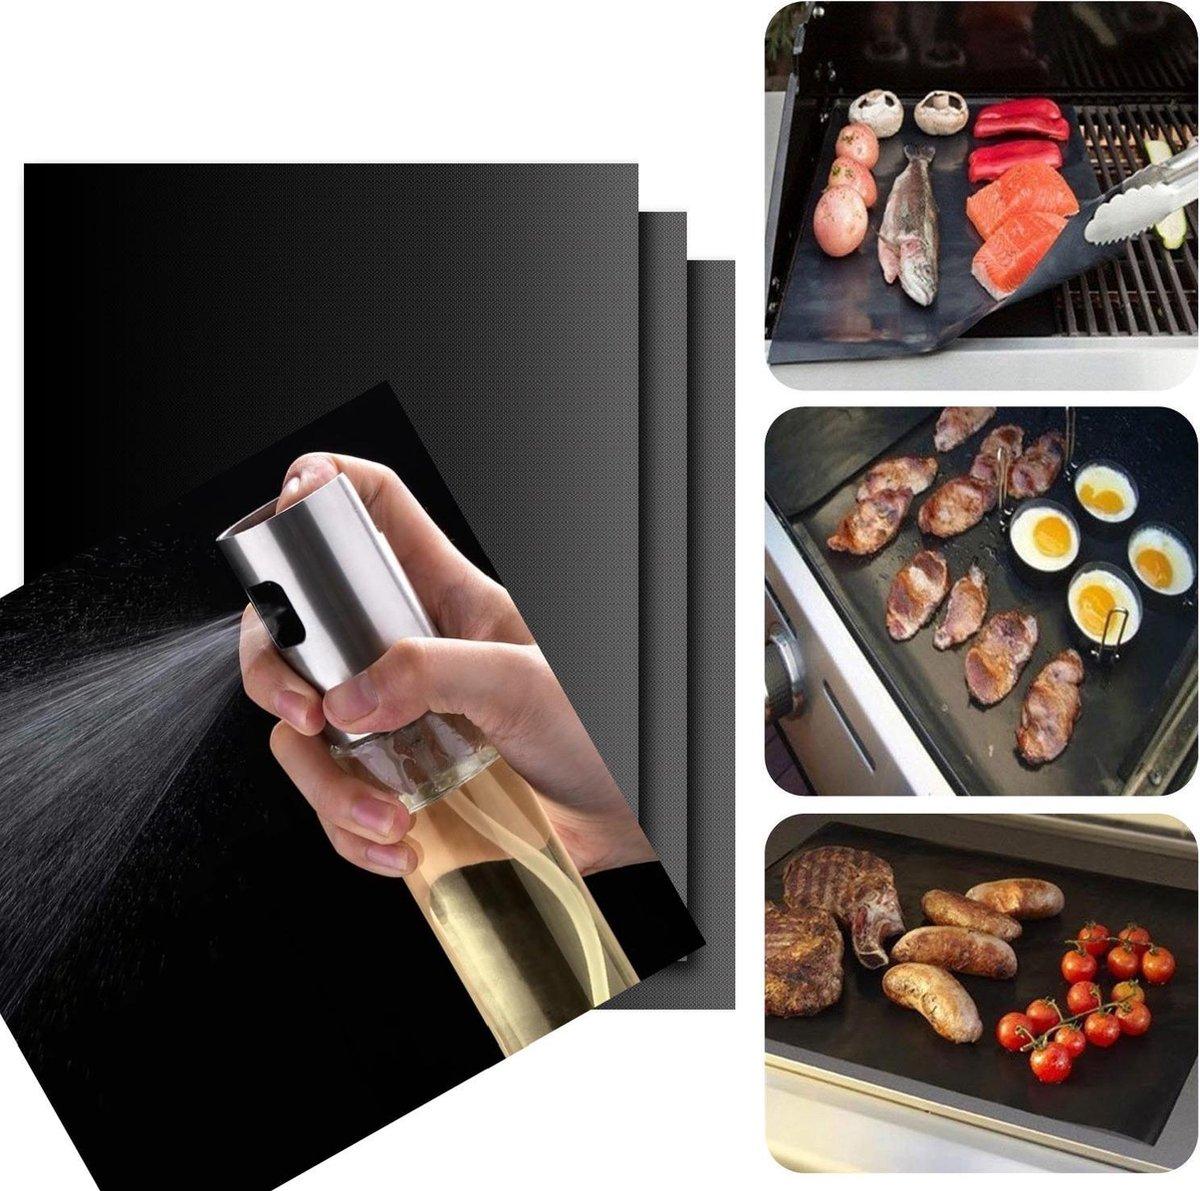 LifeLoom® 3 stuks Grill Mat BBQ Mat met 1x Olijfolie verstuiver - Olijfolie fles - bbq folie met olijfolie flesje.